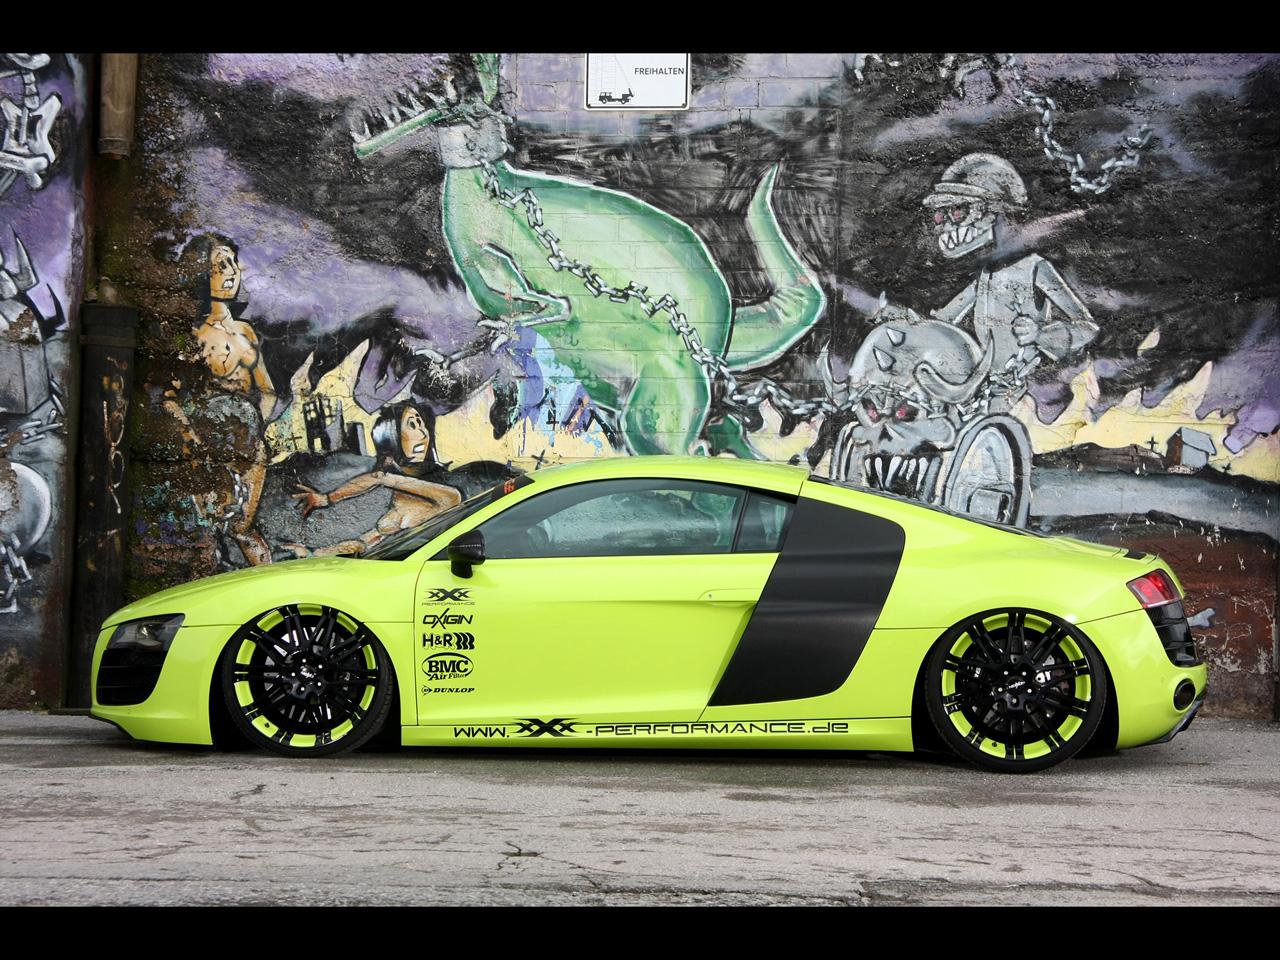 Audi R8 V10 XXX Performance